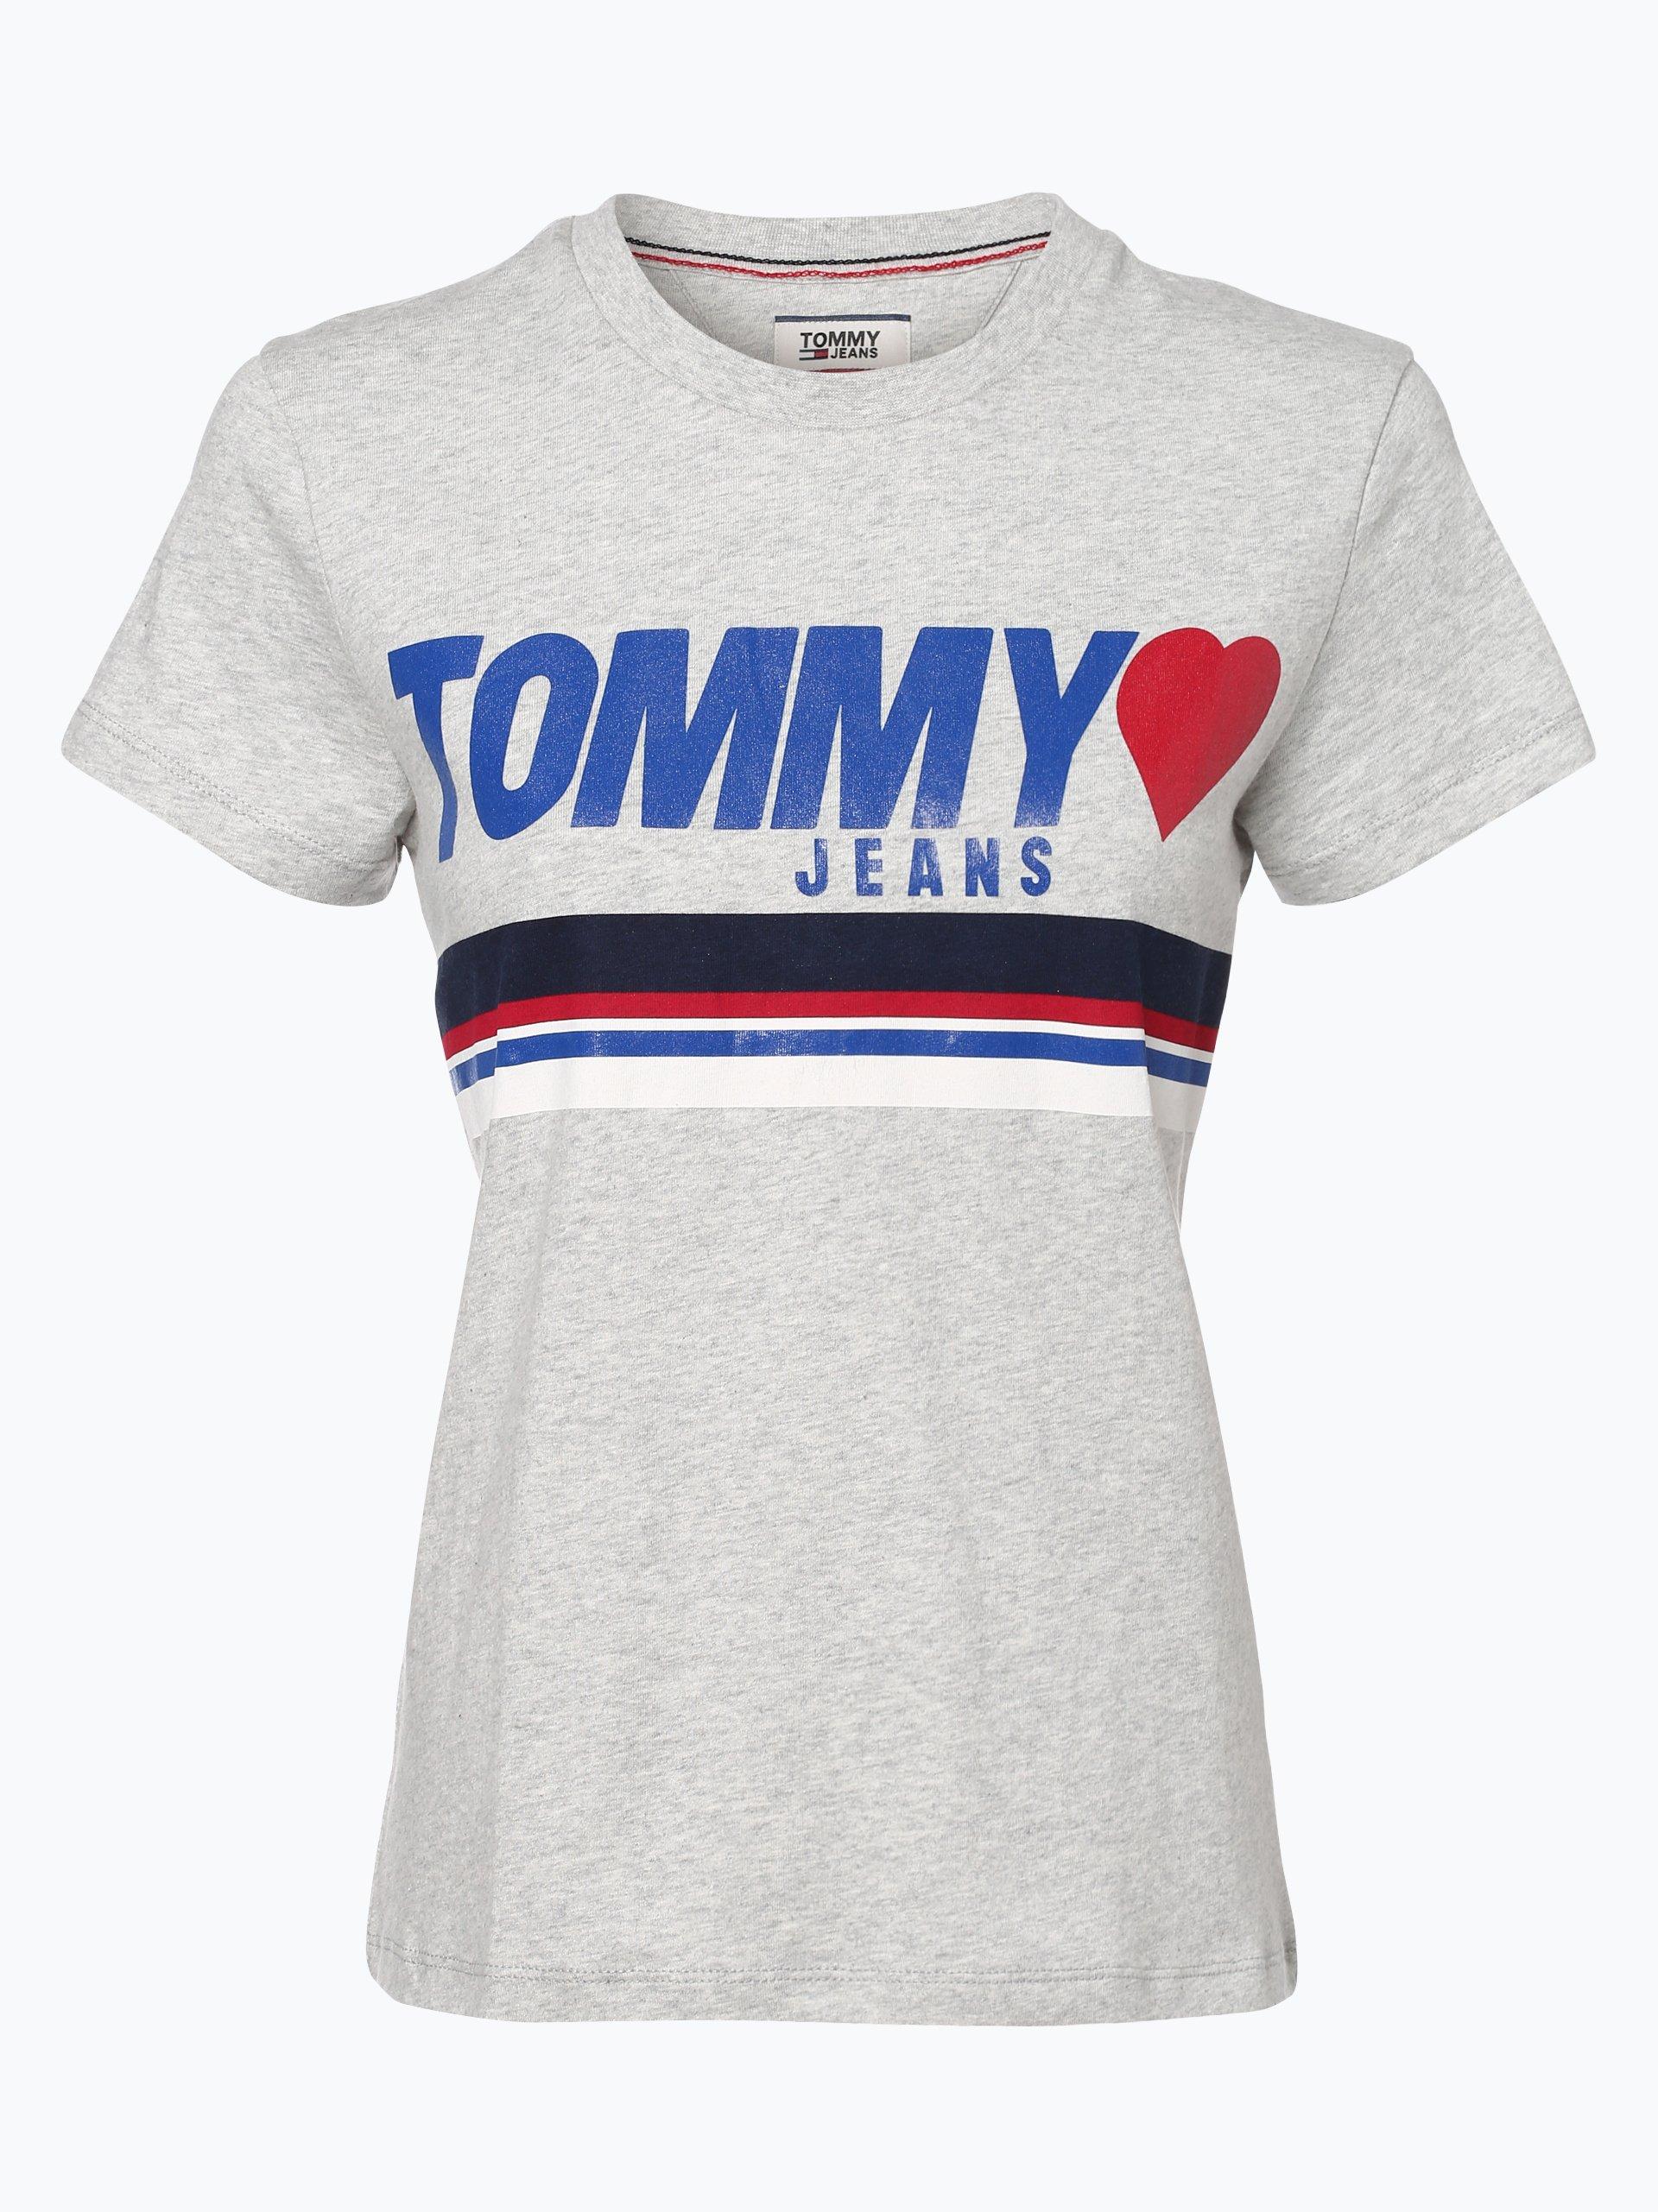 tommy jeans damen t shirt grau gemustert online kaufen. Black Bedroom Furniture Sets. Home Design Ideas